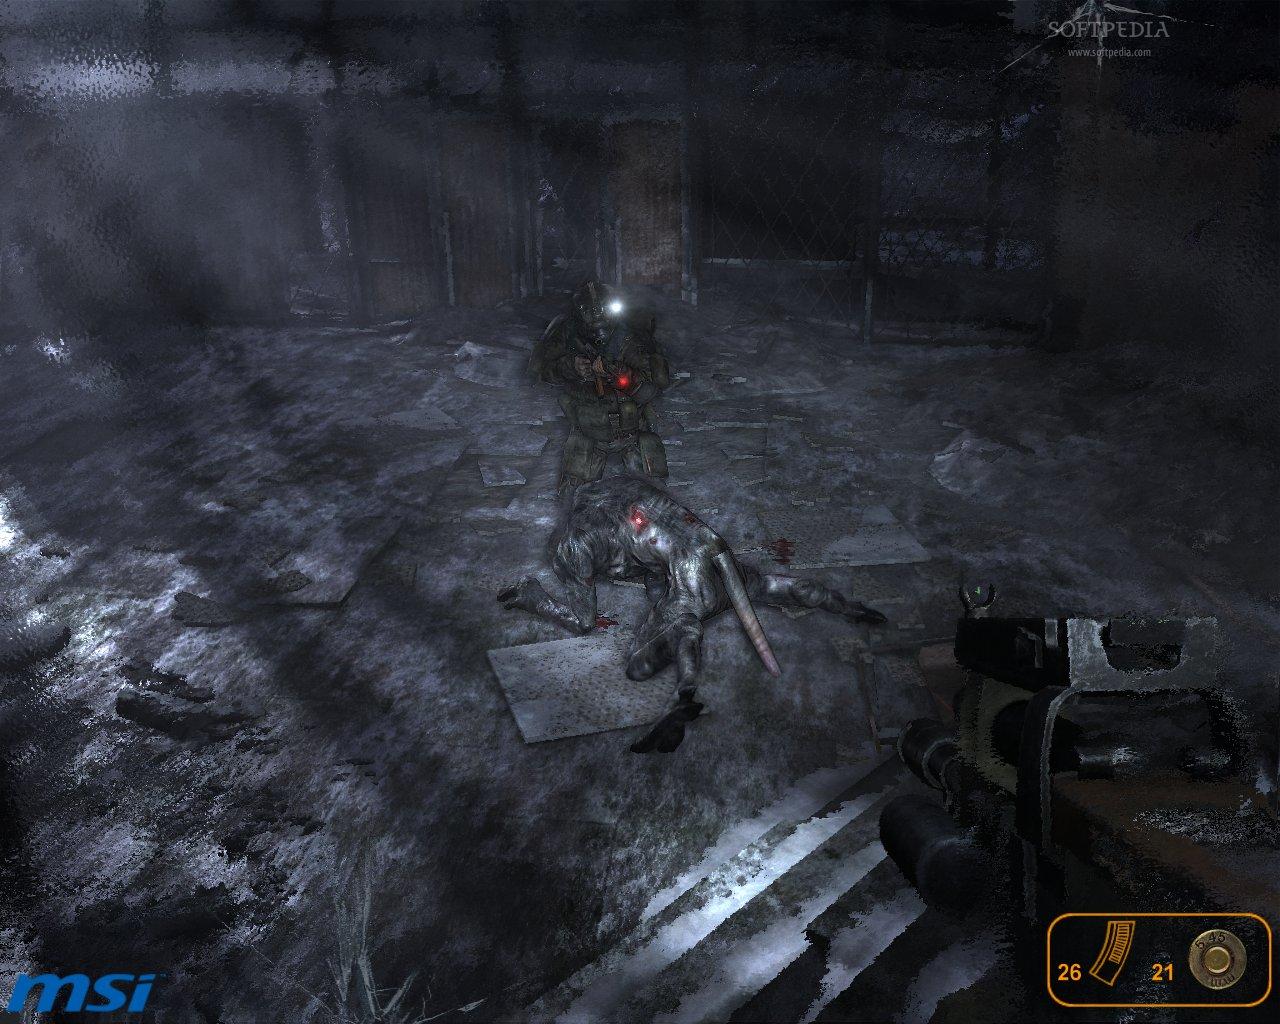 Metro 2033 Demo